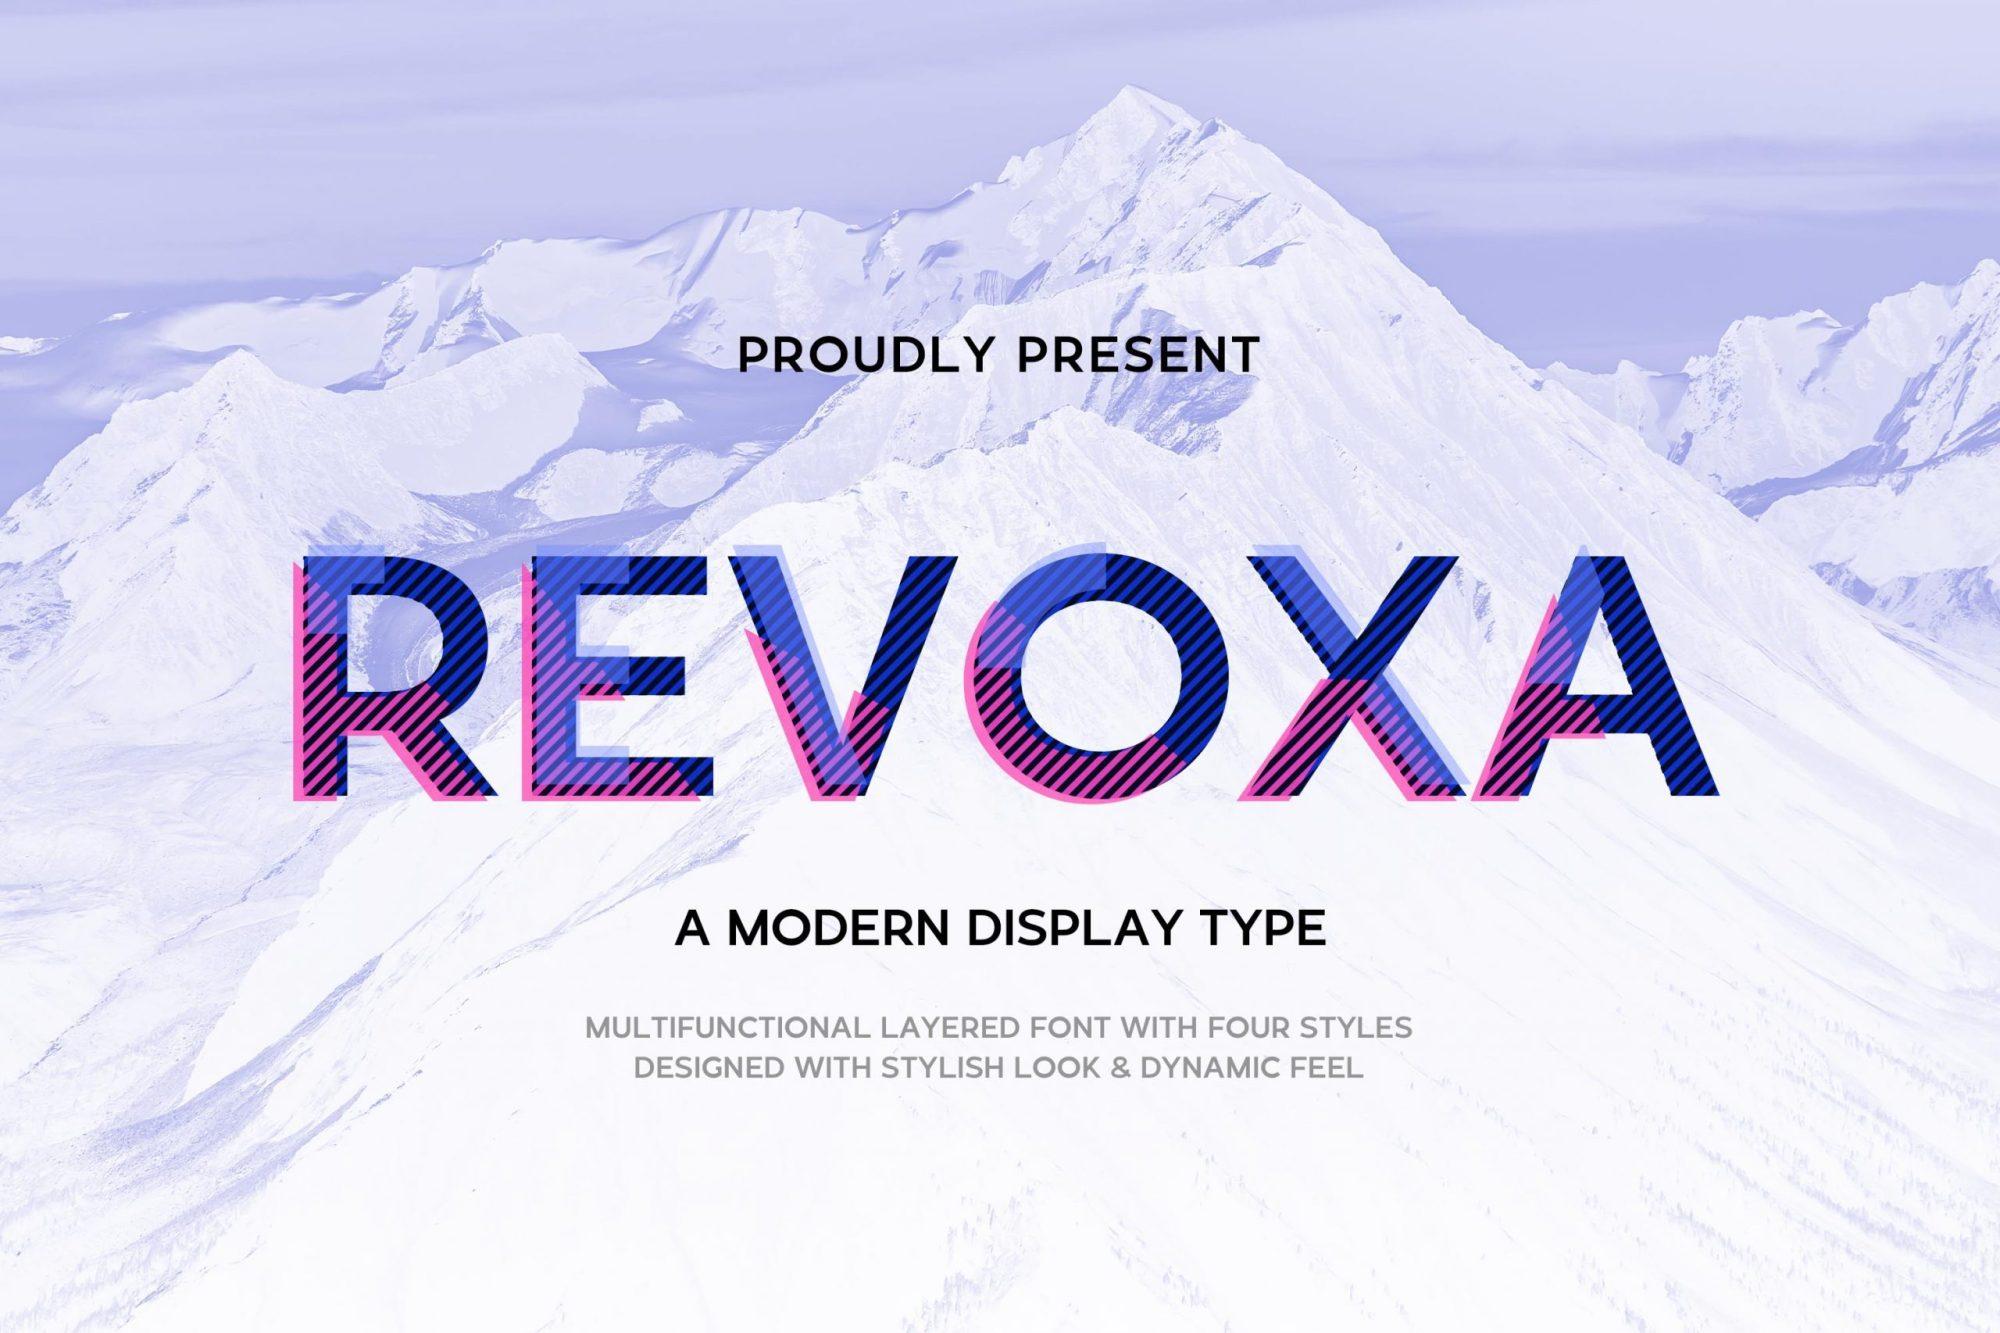 Revoxa-Modern-Display-Typeface-1